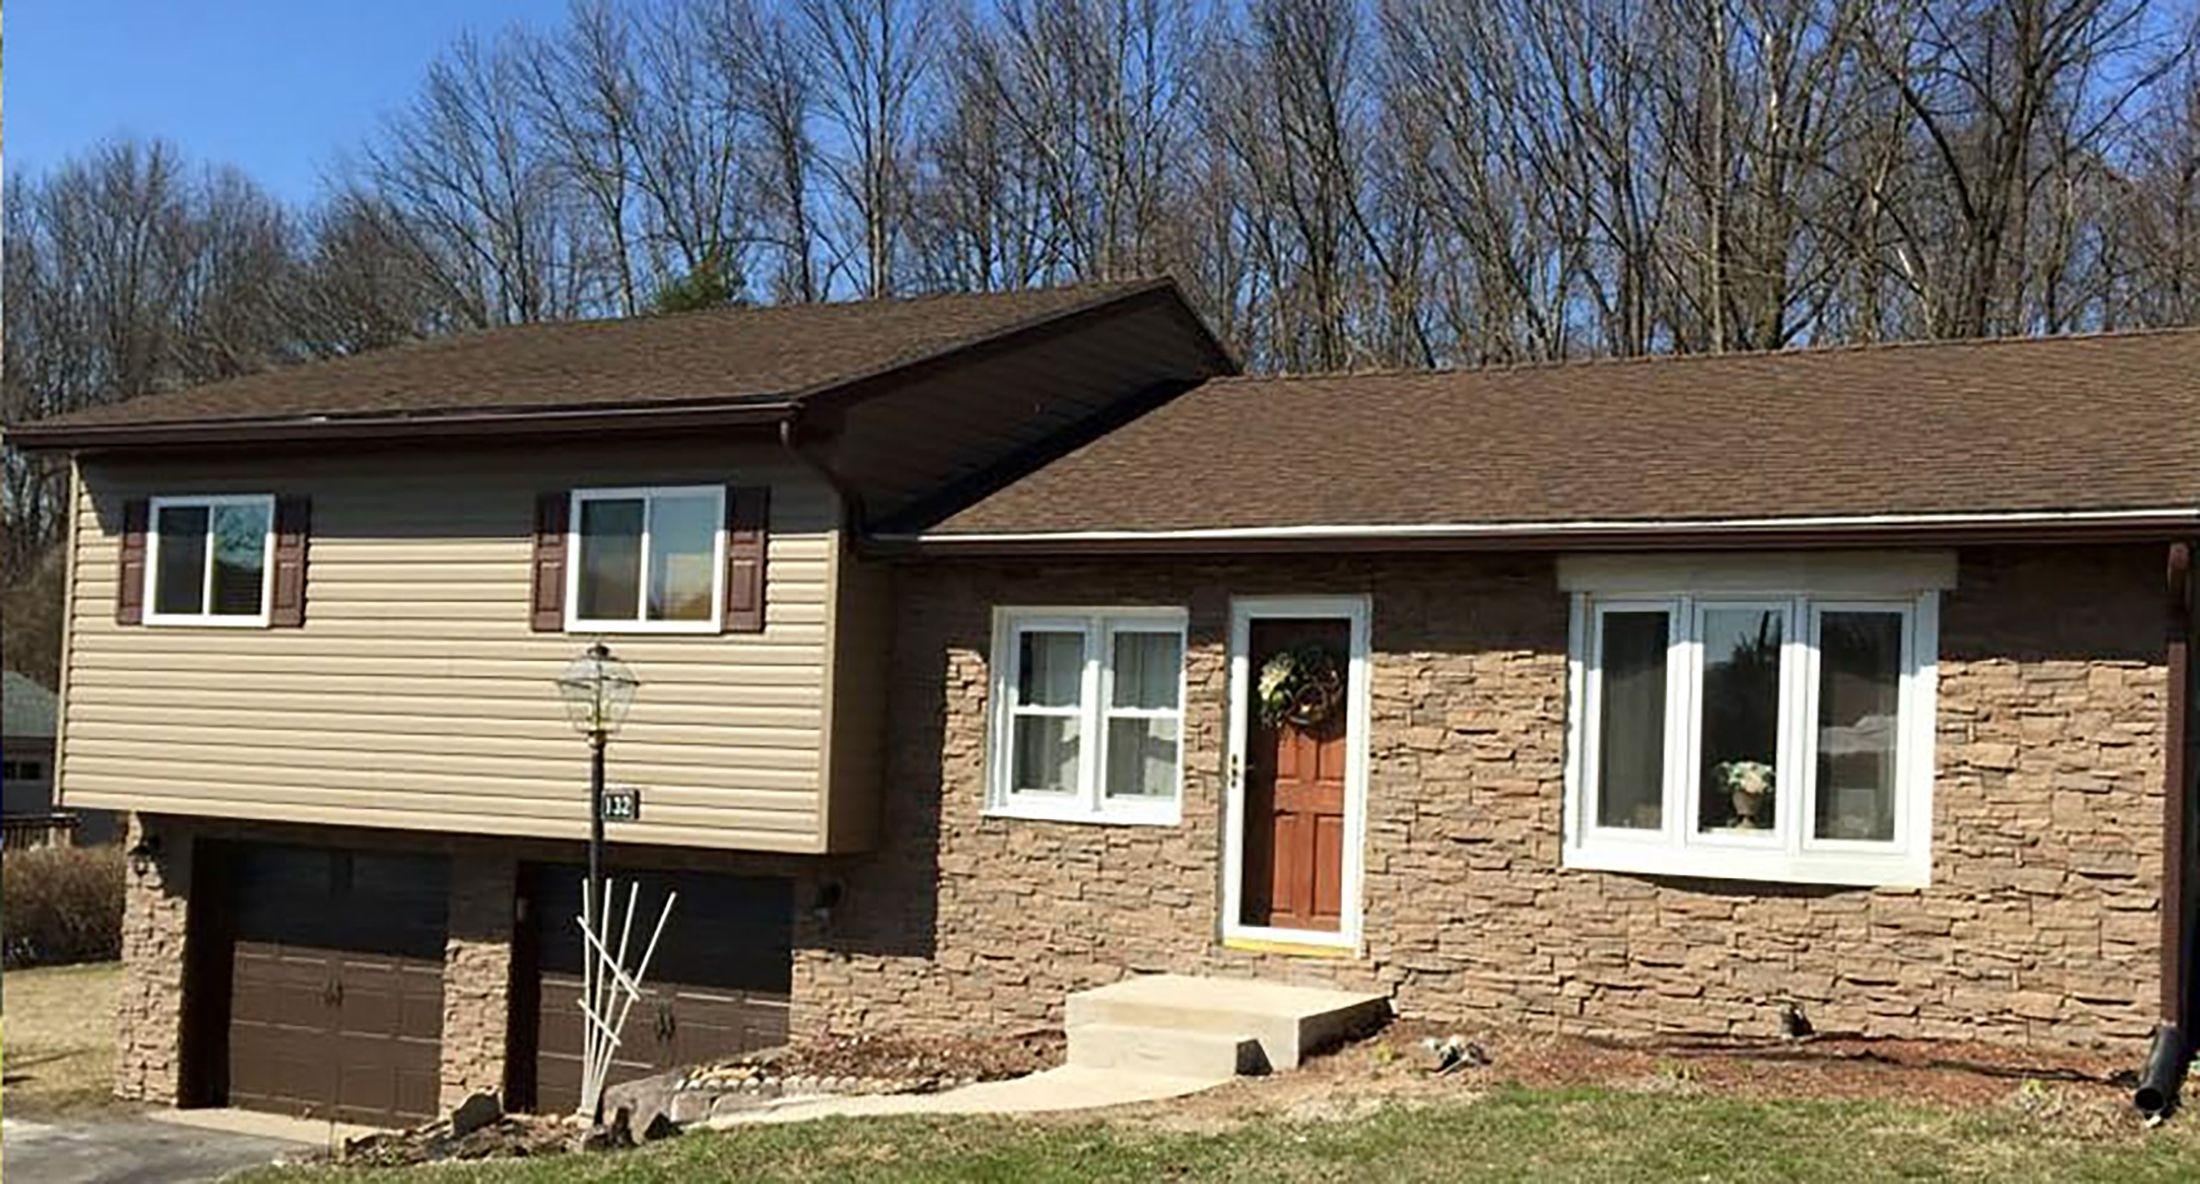 Refacing Brick Exterior Options For Covering Exterior Brick Exterior Brick Stone Siding Exterior Exterior Brick Veneer